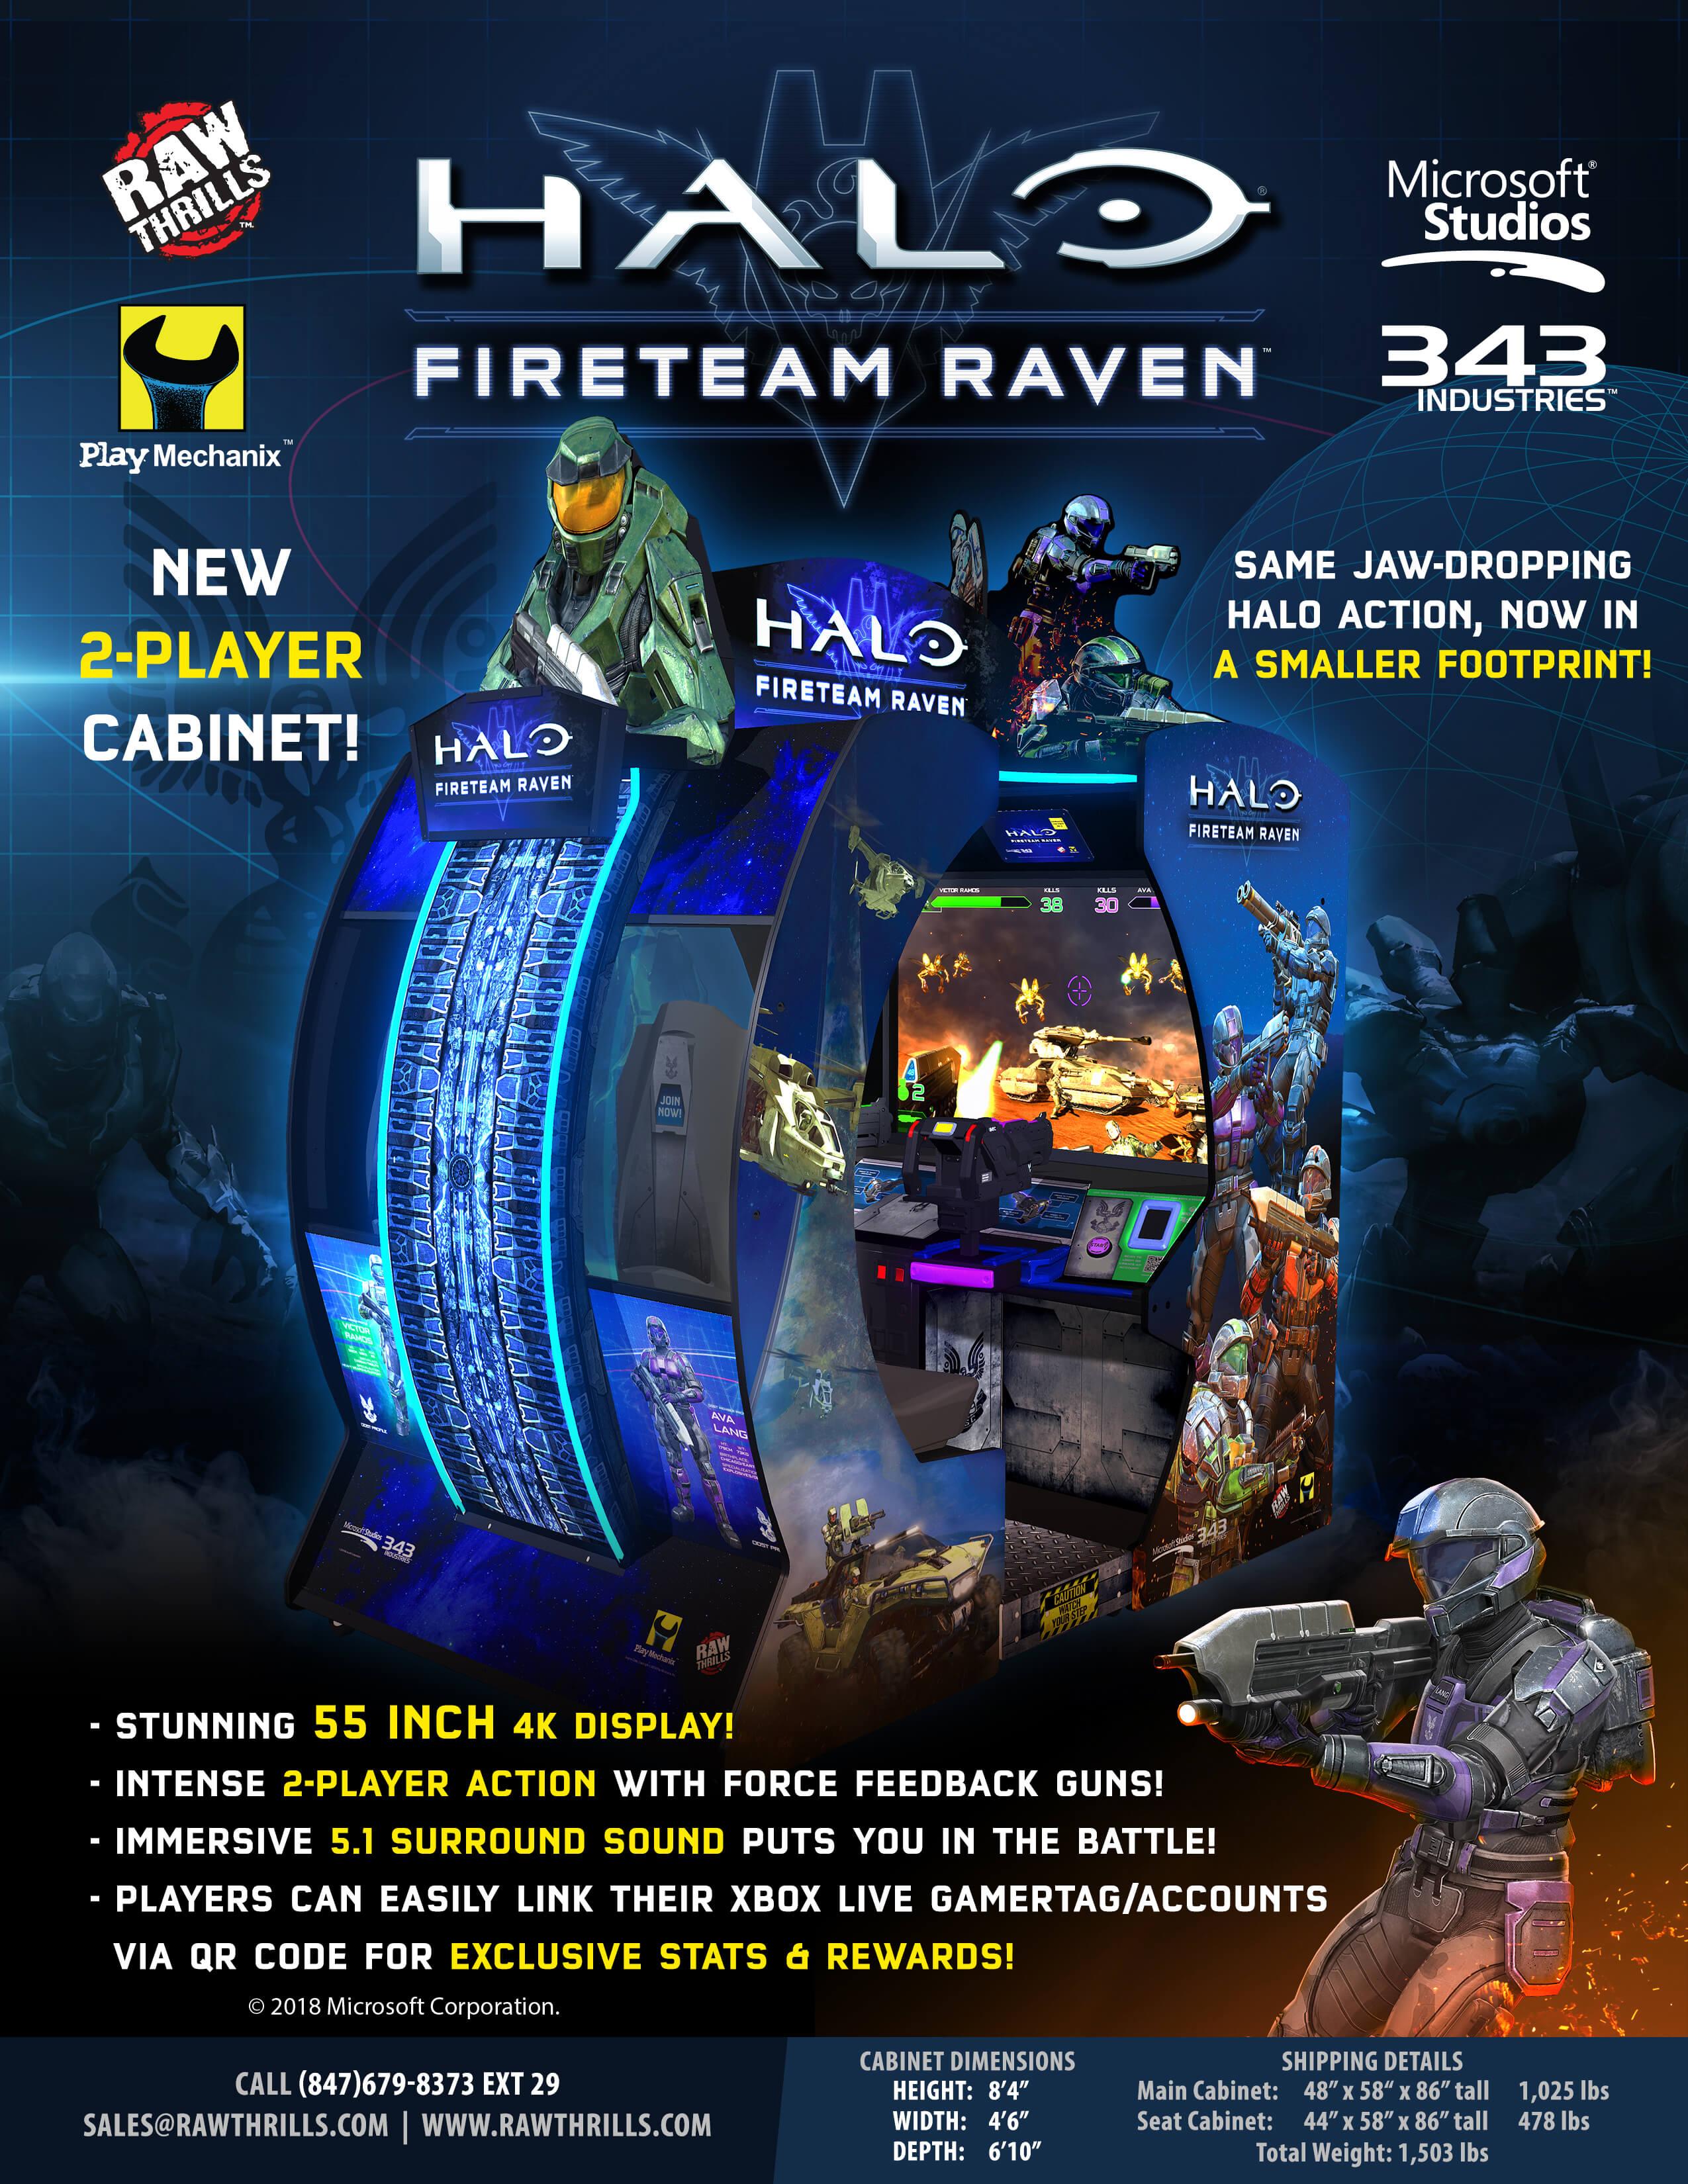 Halo: Fireteam Raven – Raw Thrills, Inc